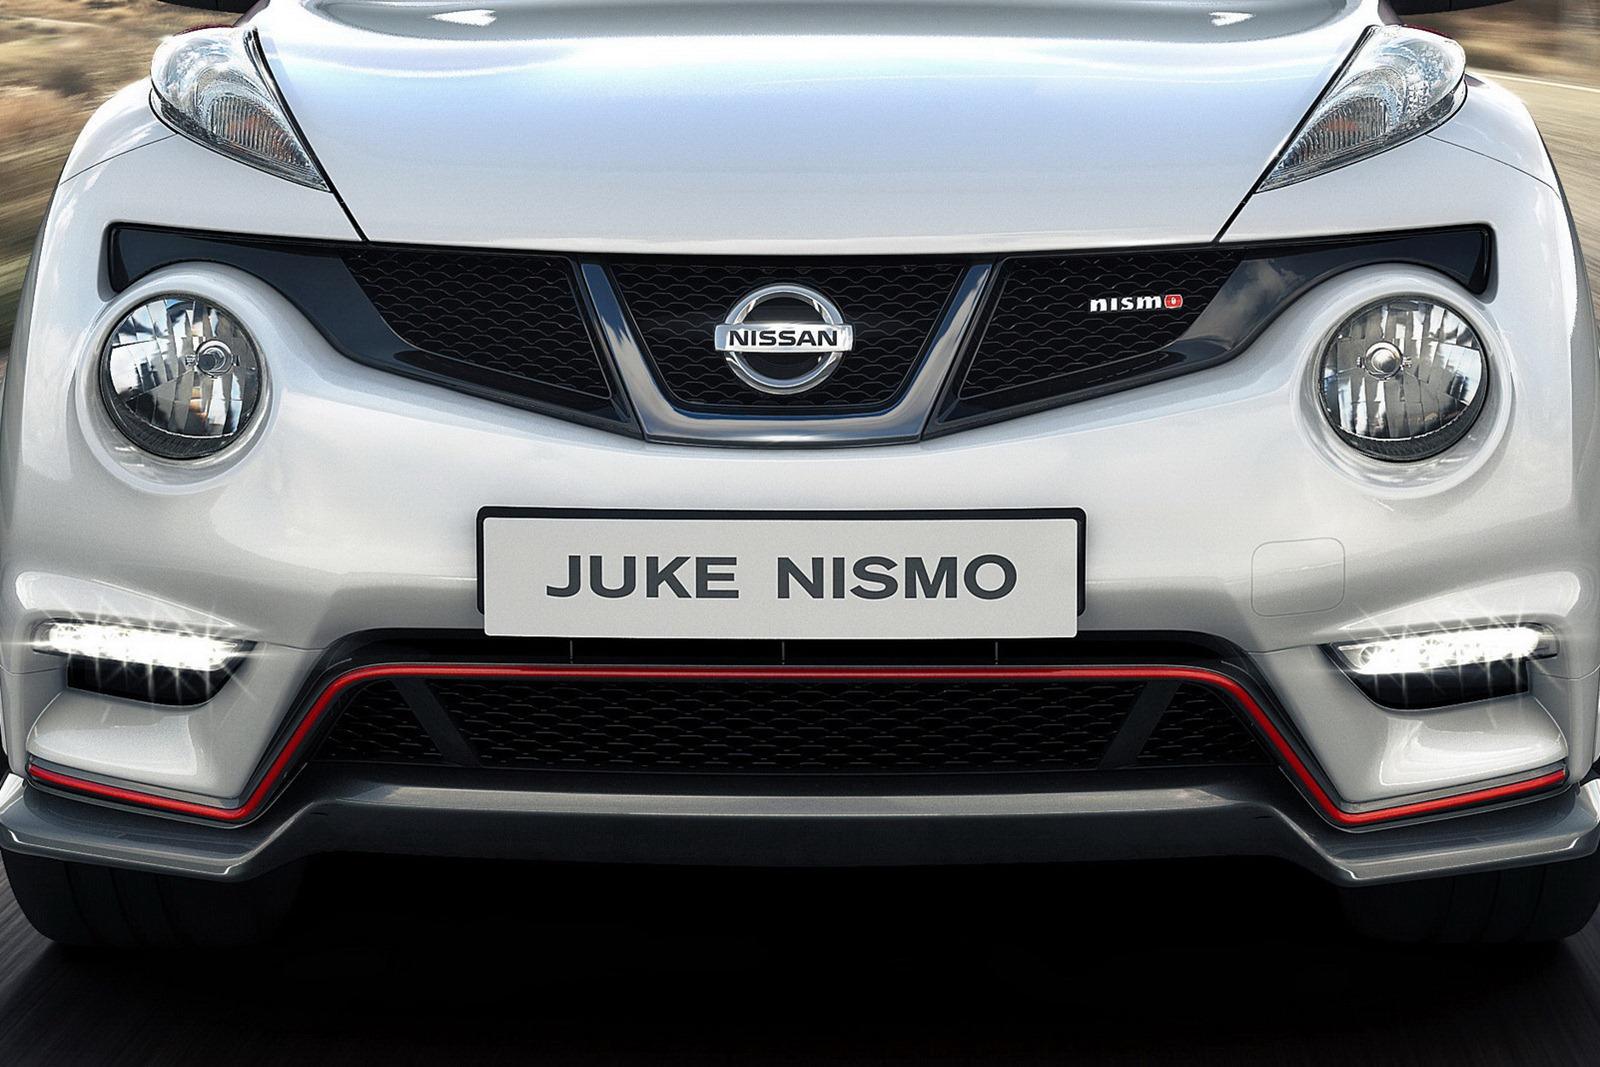 2013 Nissan Juke NISMO.